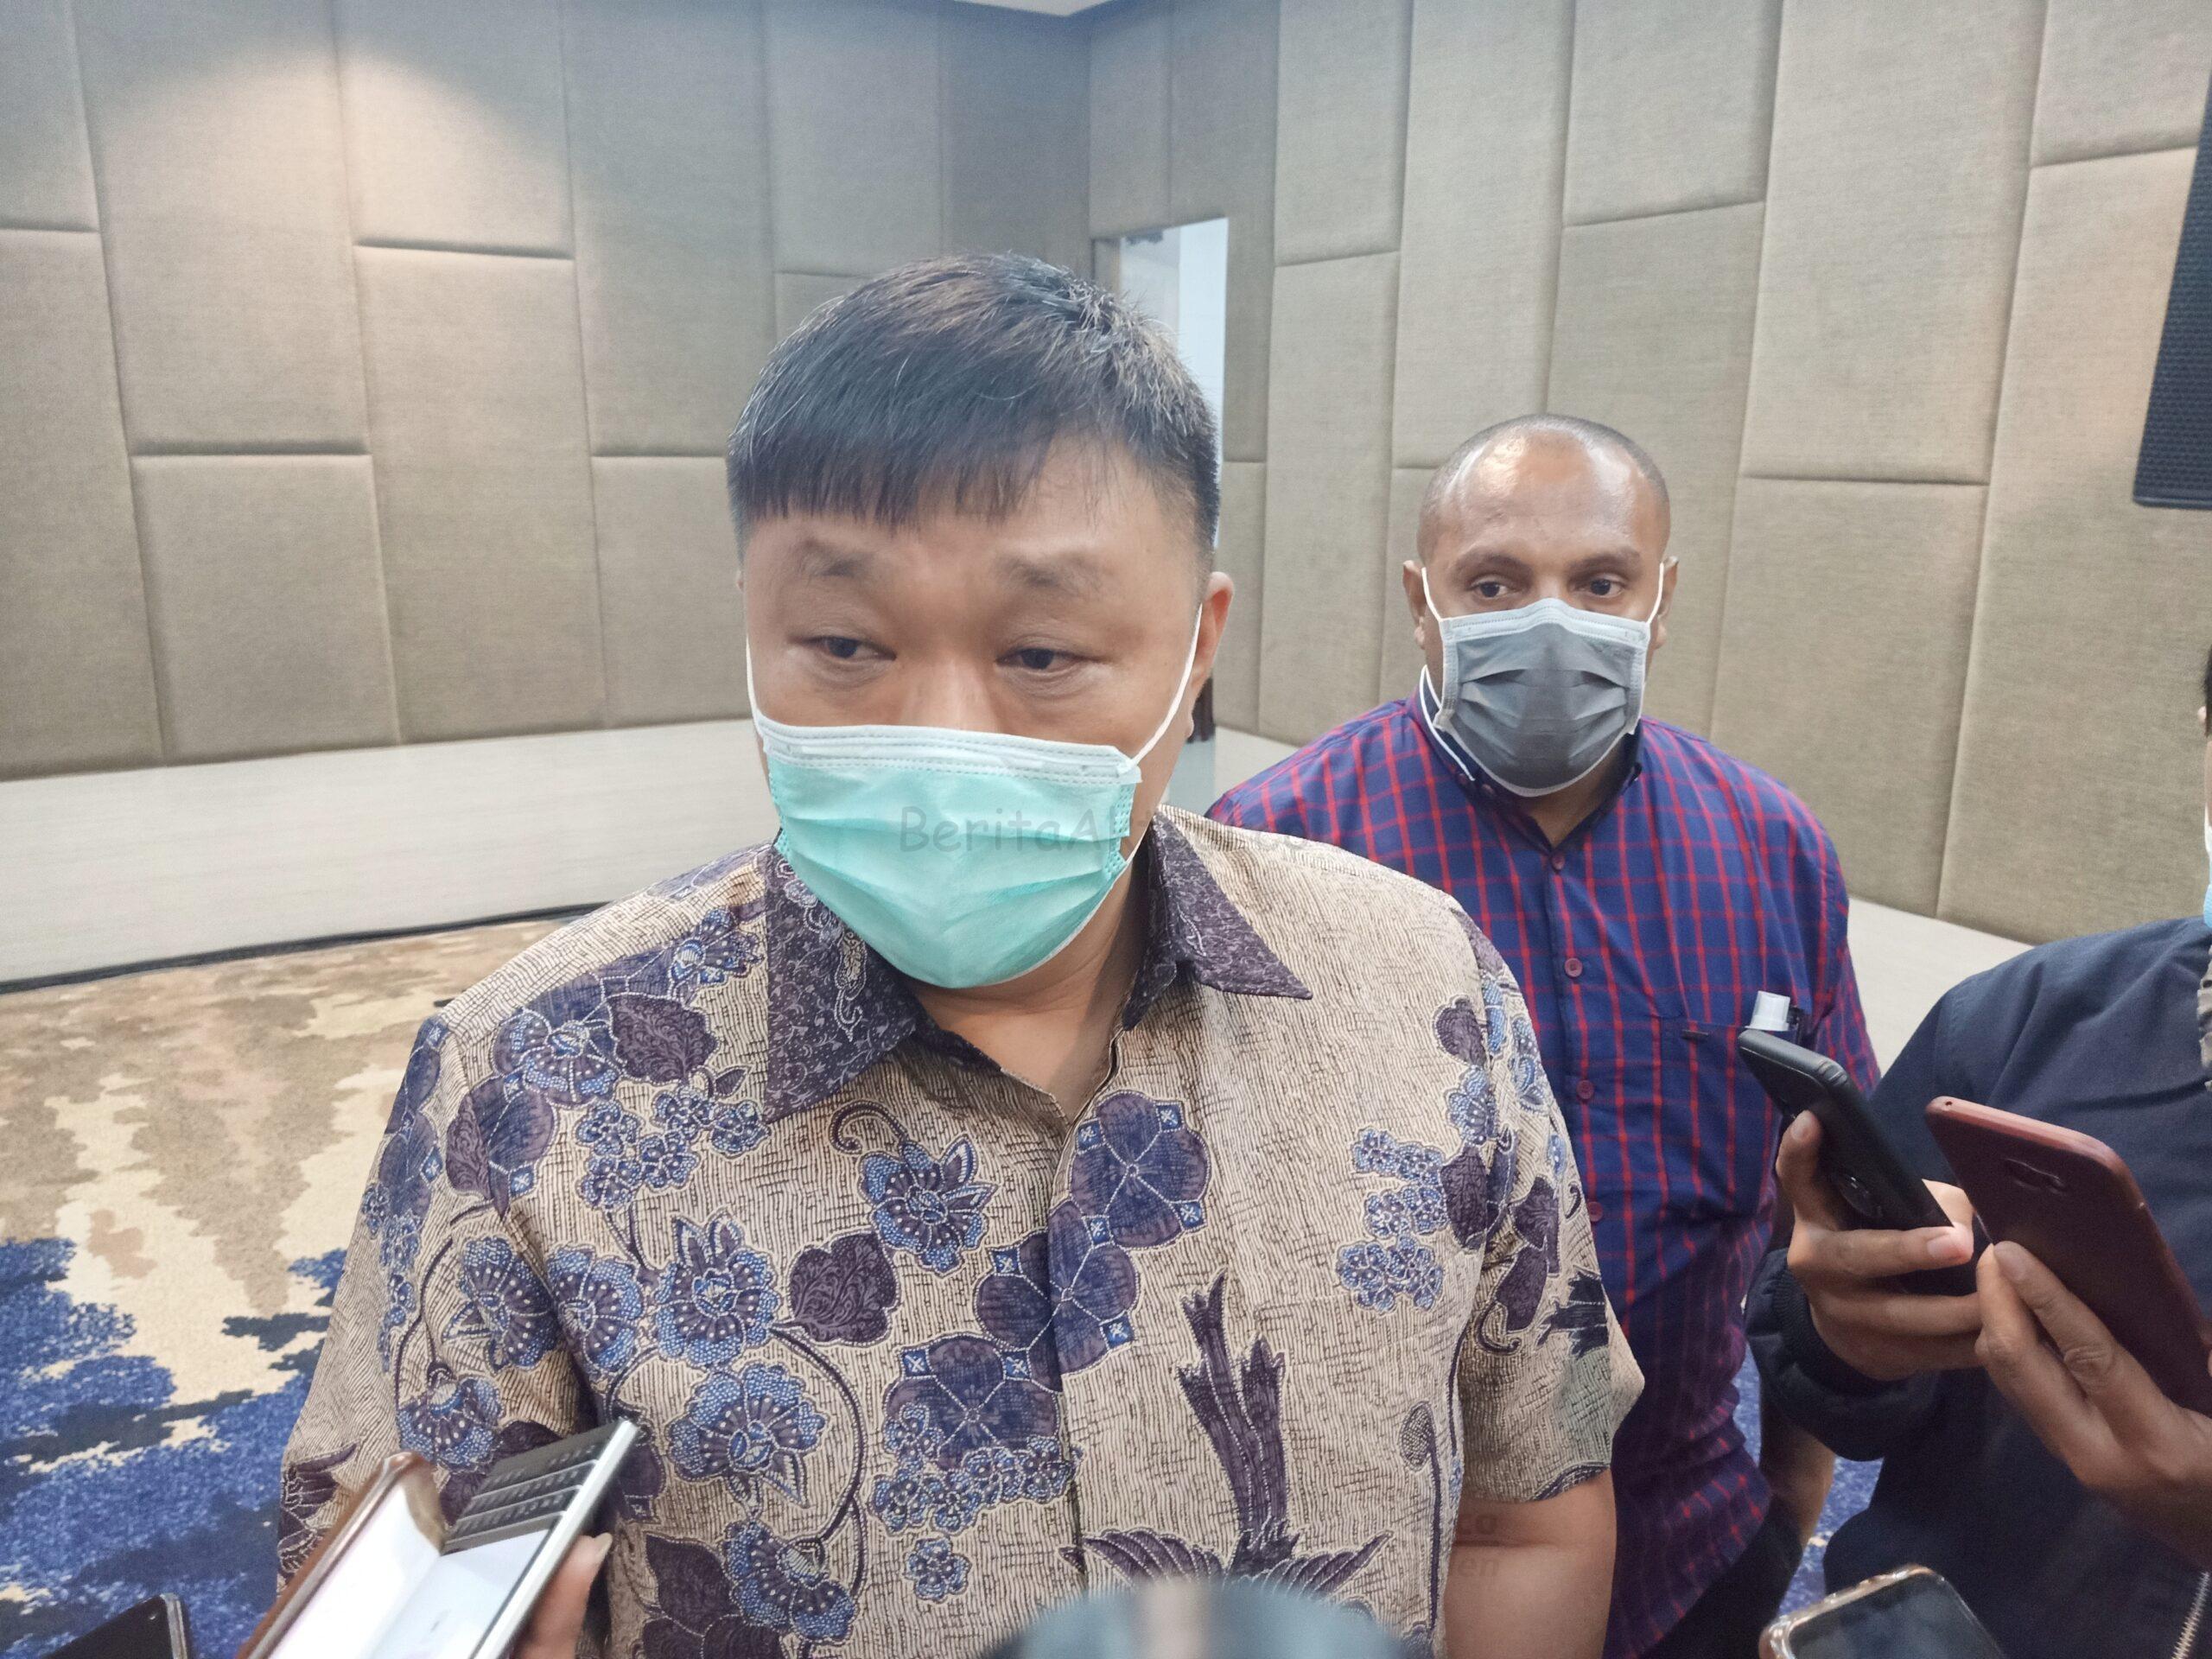 Rico Sia: Tuntutan Itu Ditujukan ke Pemprov Papua Barat, Bukan Pribadi 3 IMG 20210217 182240 1 scaled